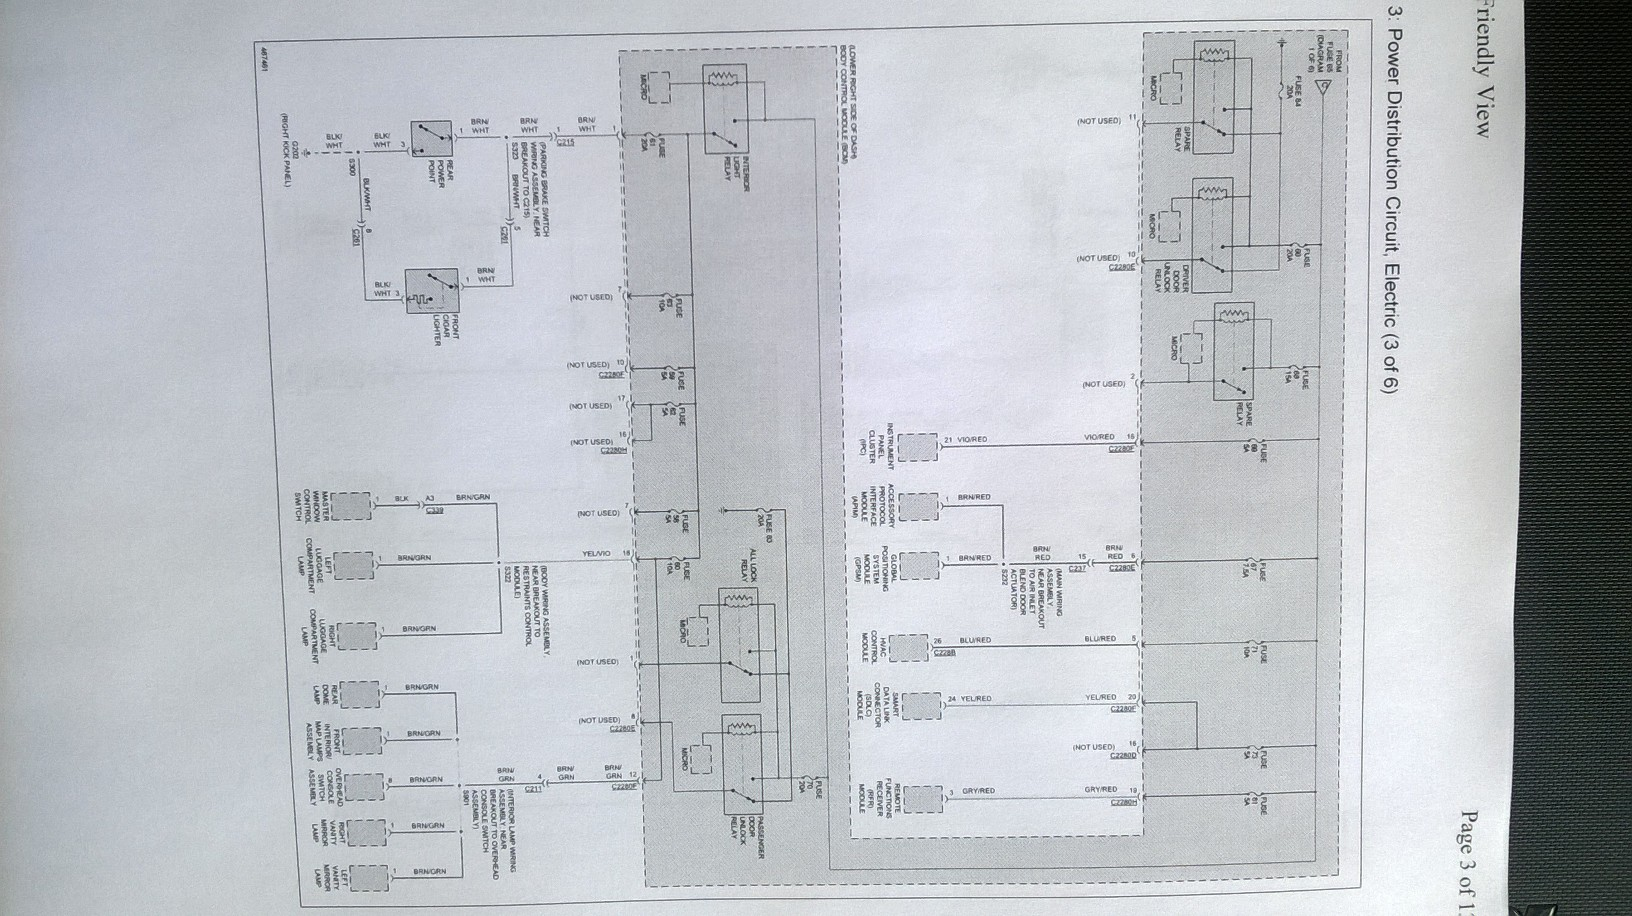 2015 Focus St3 Wiring Diagram Power Distribution Diagrams Name Wp 20160611 007 Views 543 Size 4356 Kb